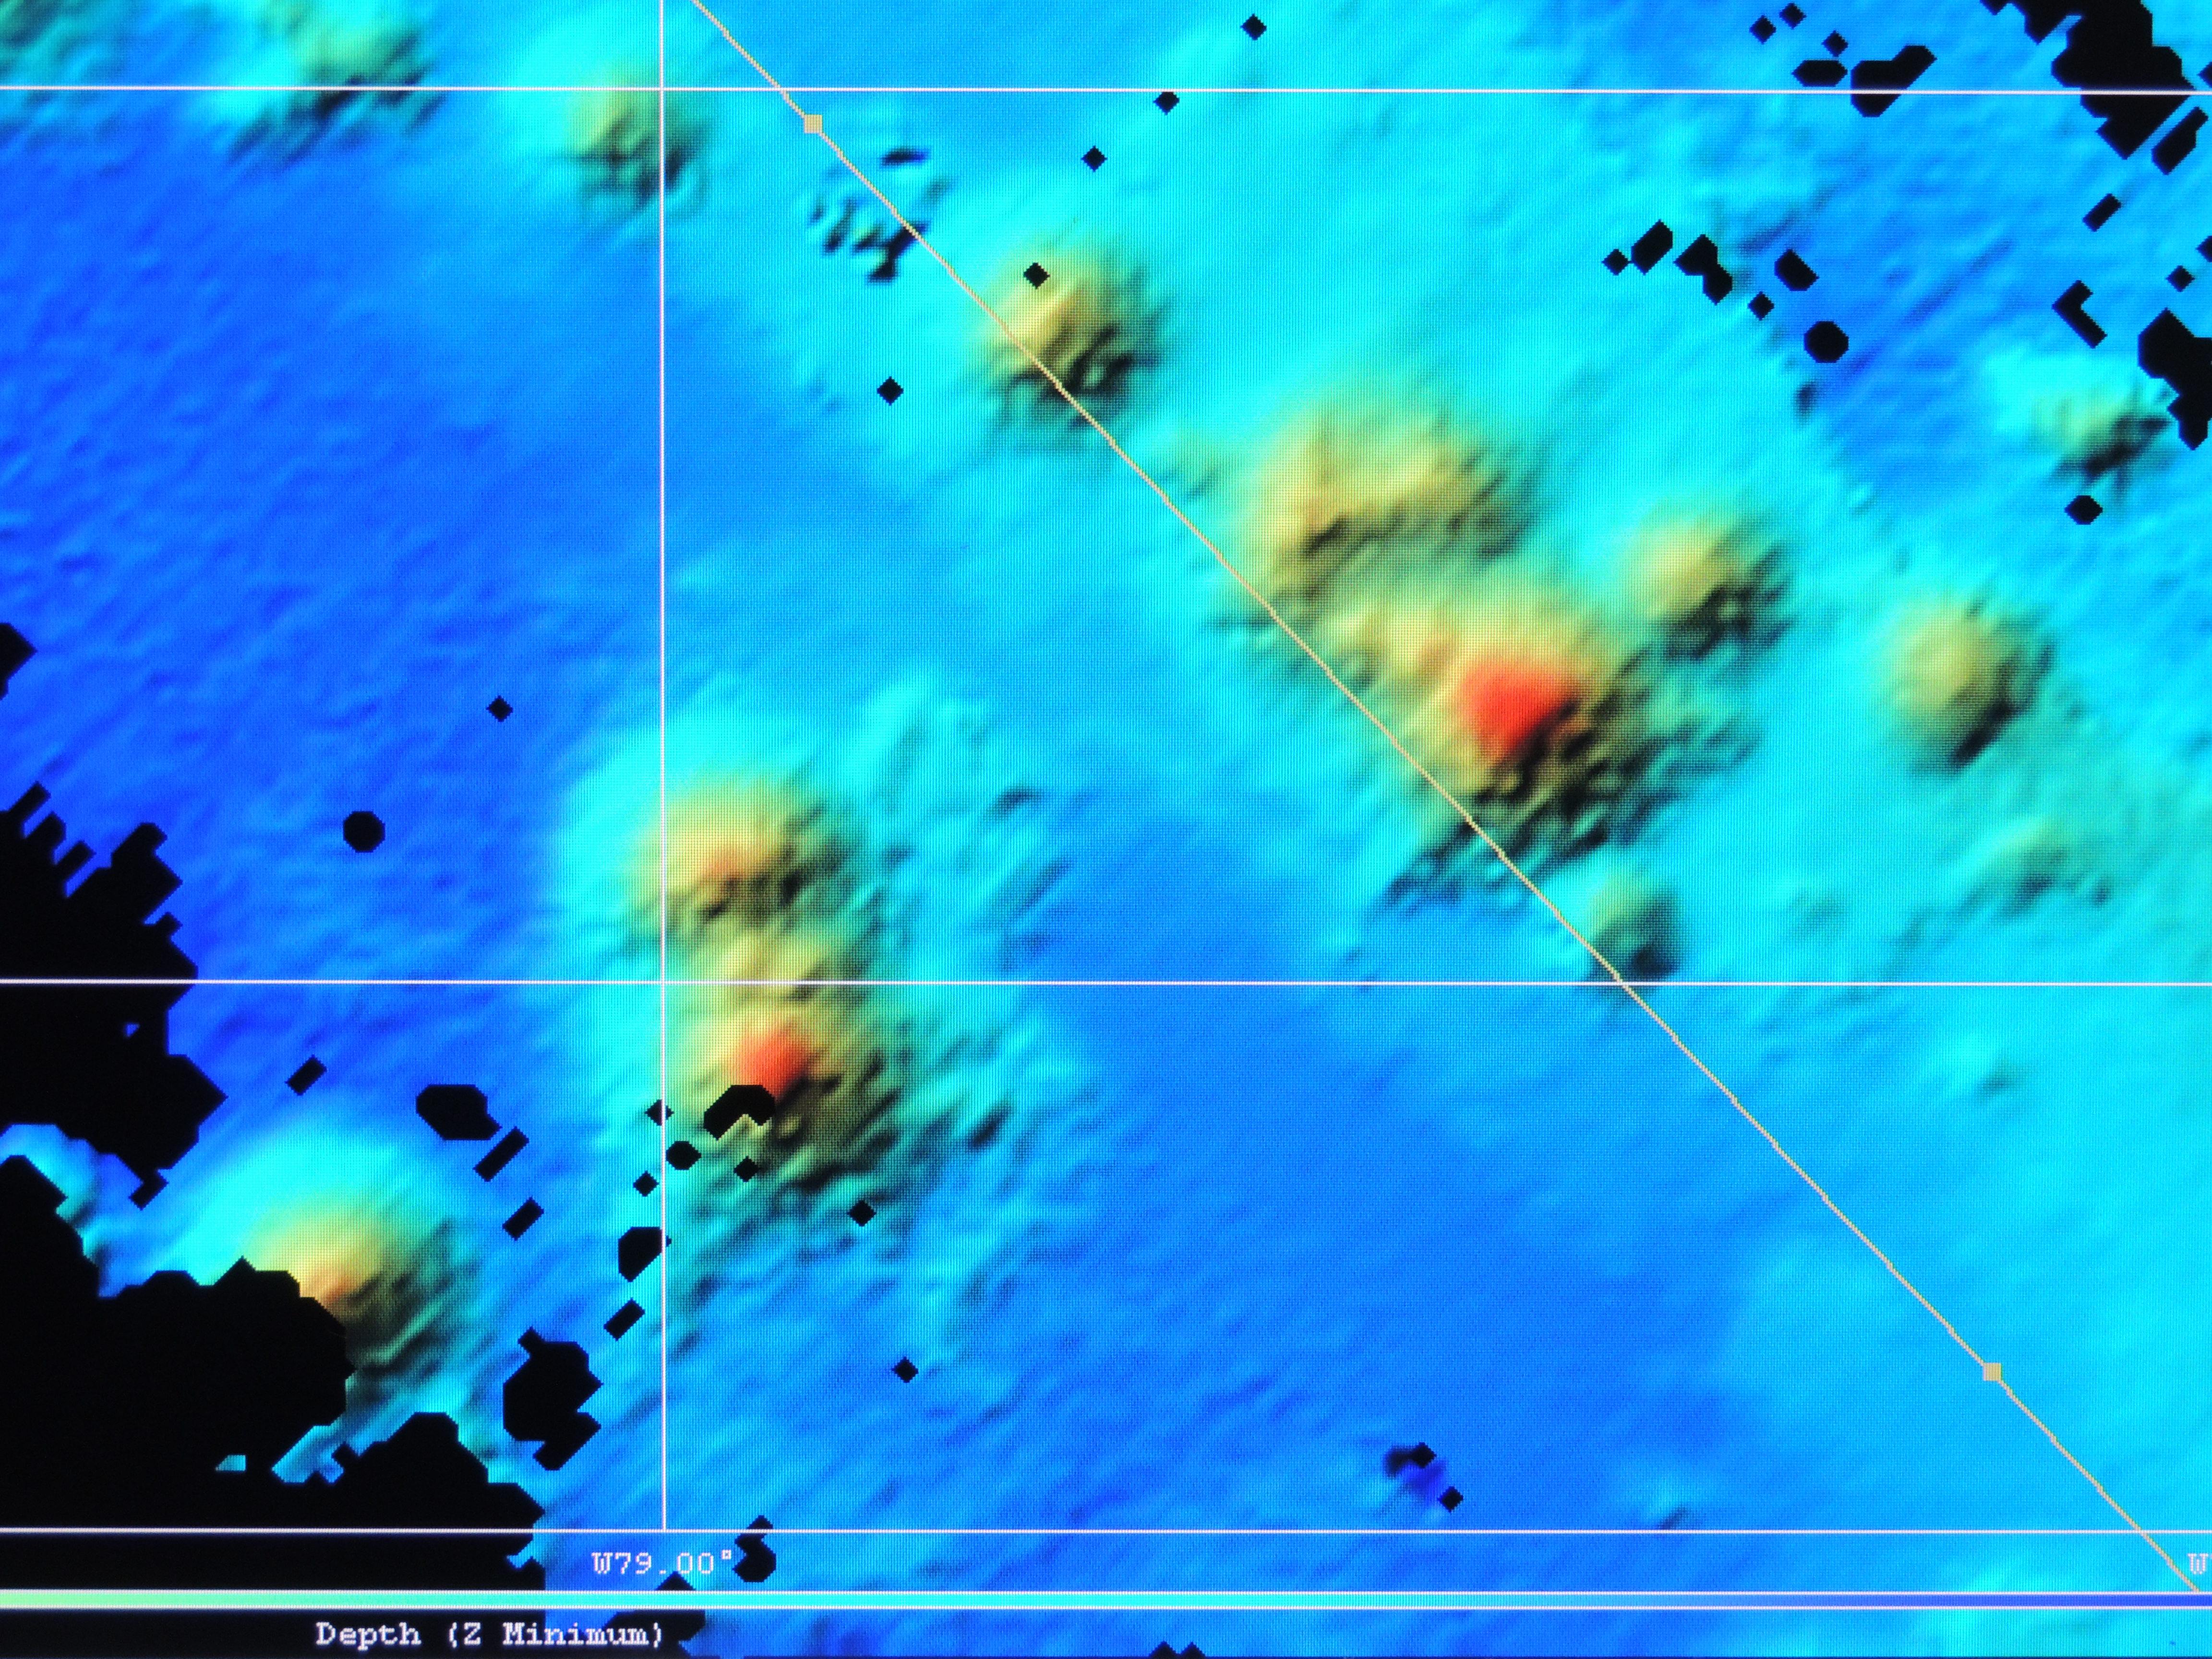 Uctd noaa teacher at sea blog for Another word for ocean floor